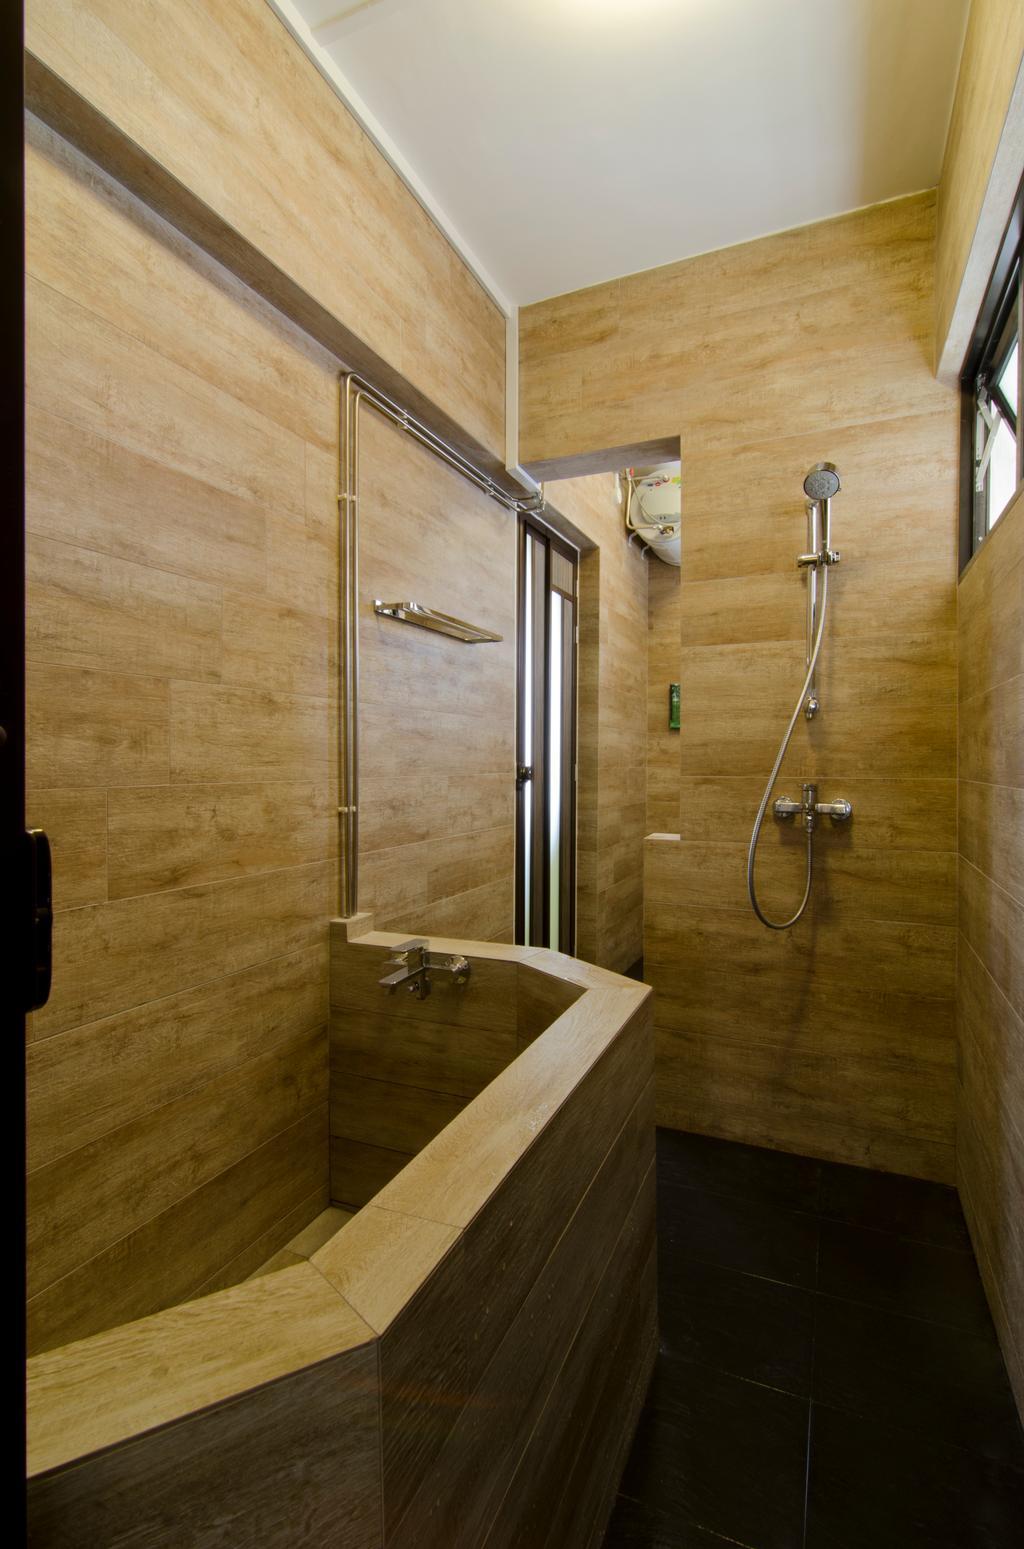 Transitional, HDB, Bathroom, Bukit Batok, Interior Designer, Arc Square, Wooden Design Wall, Toilet Wall, Wooden Theme Bath Tub, Wooden Design Bath Tub, Shower Head